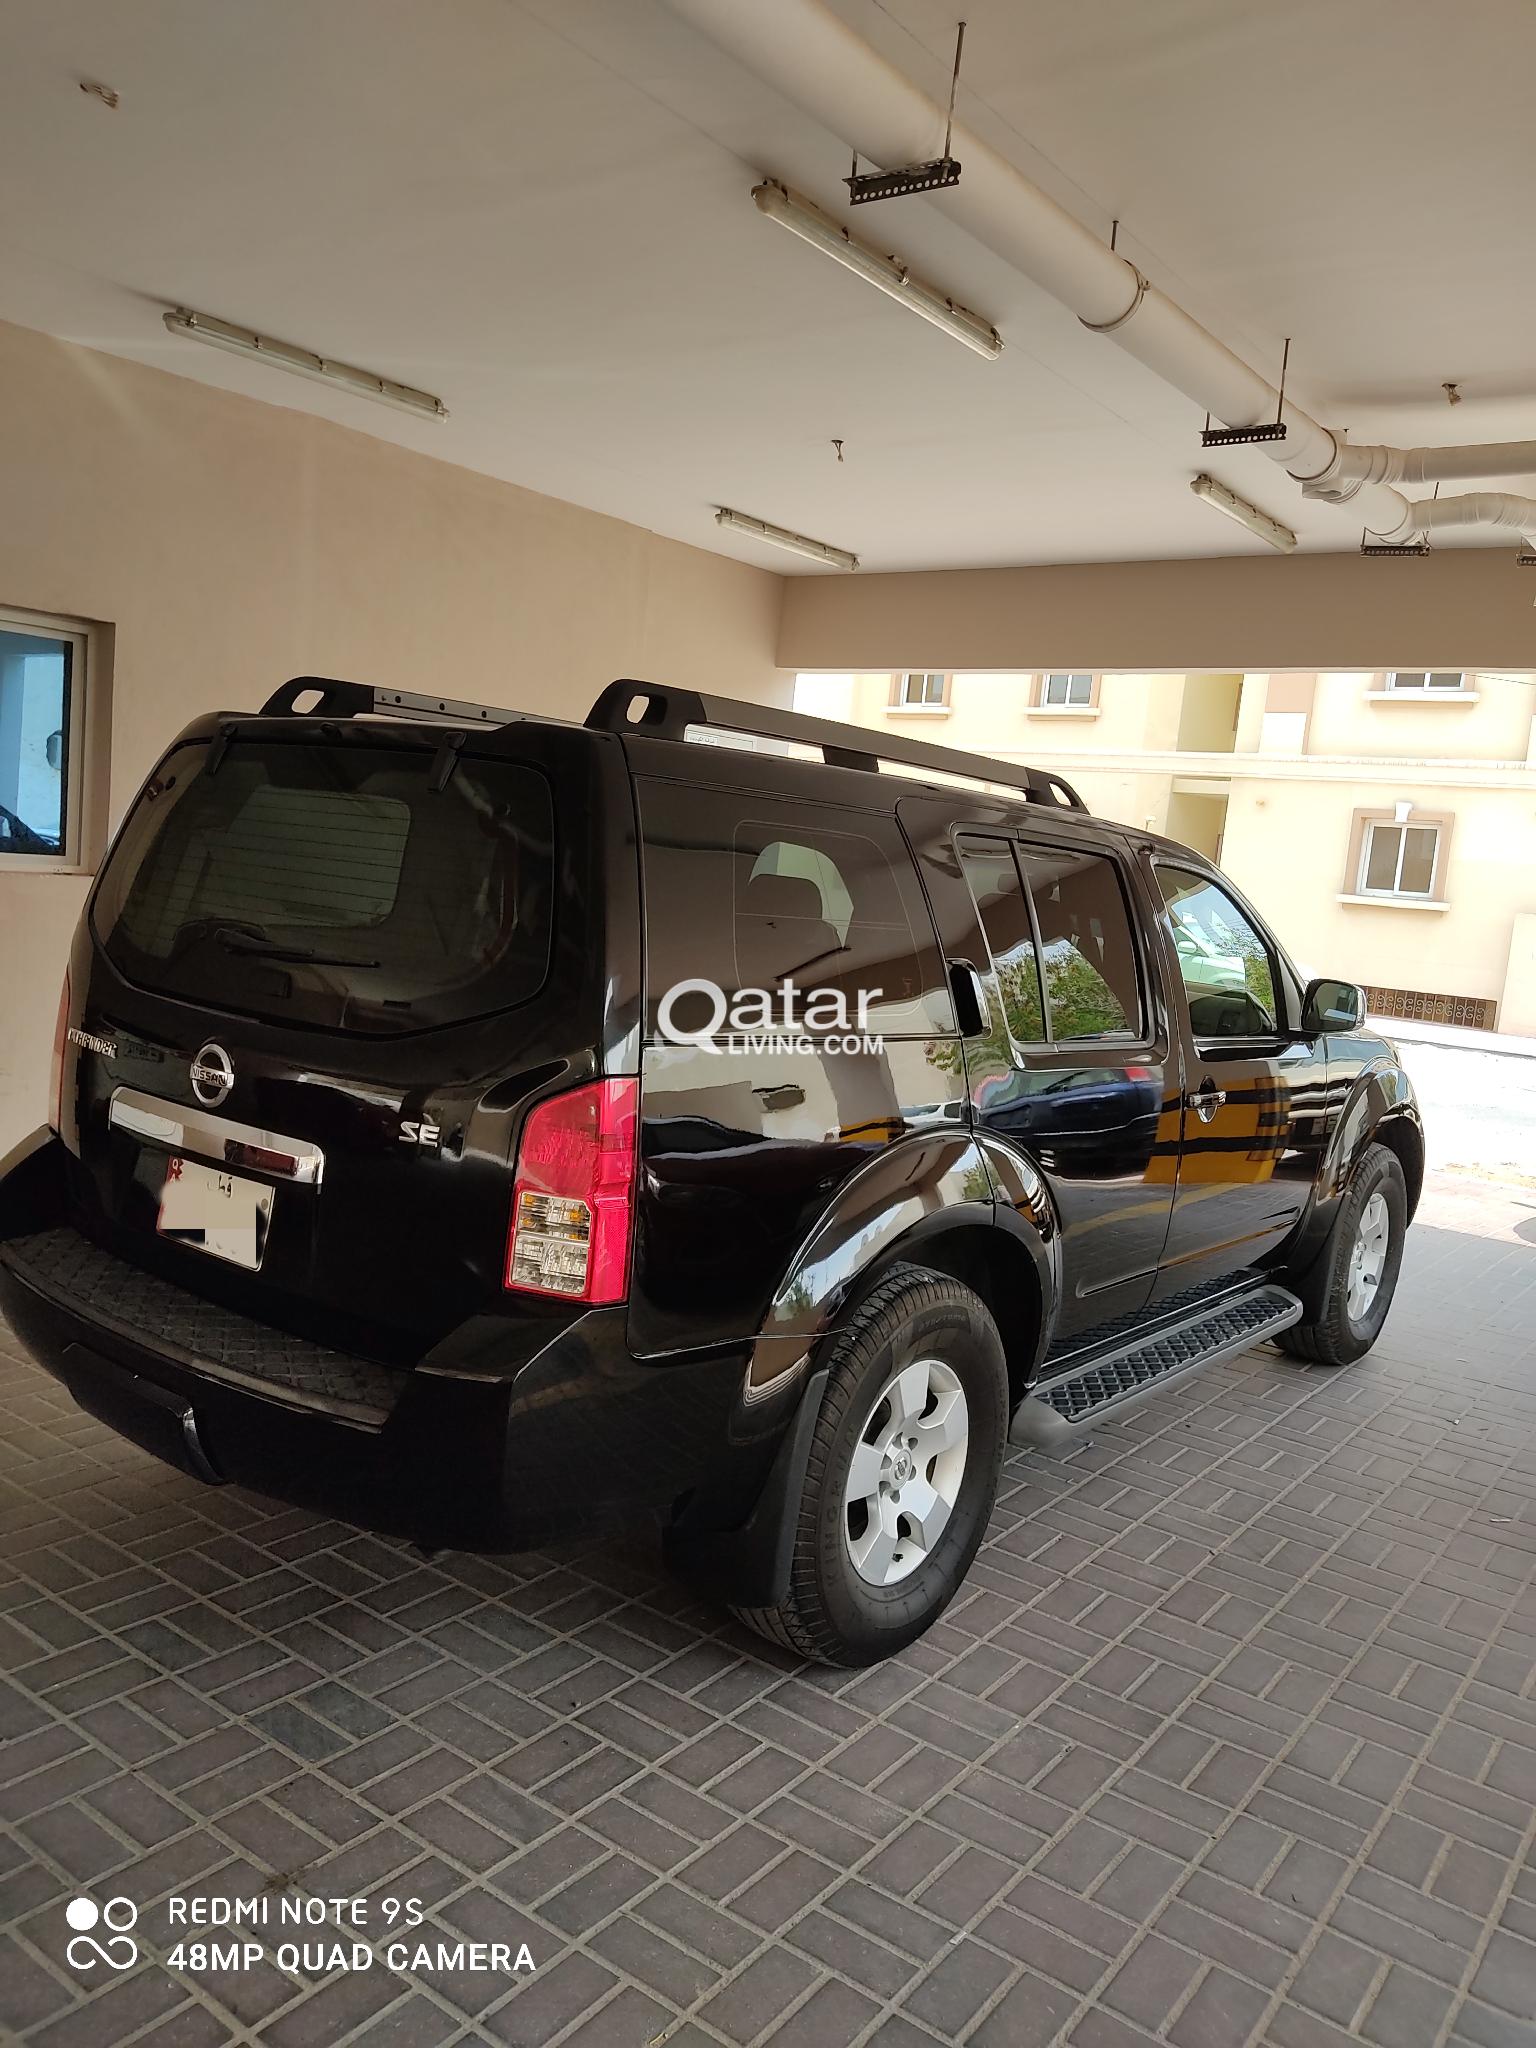 Nissan Pathfinder Se Qatar Living